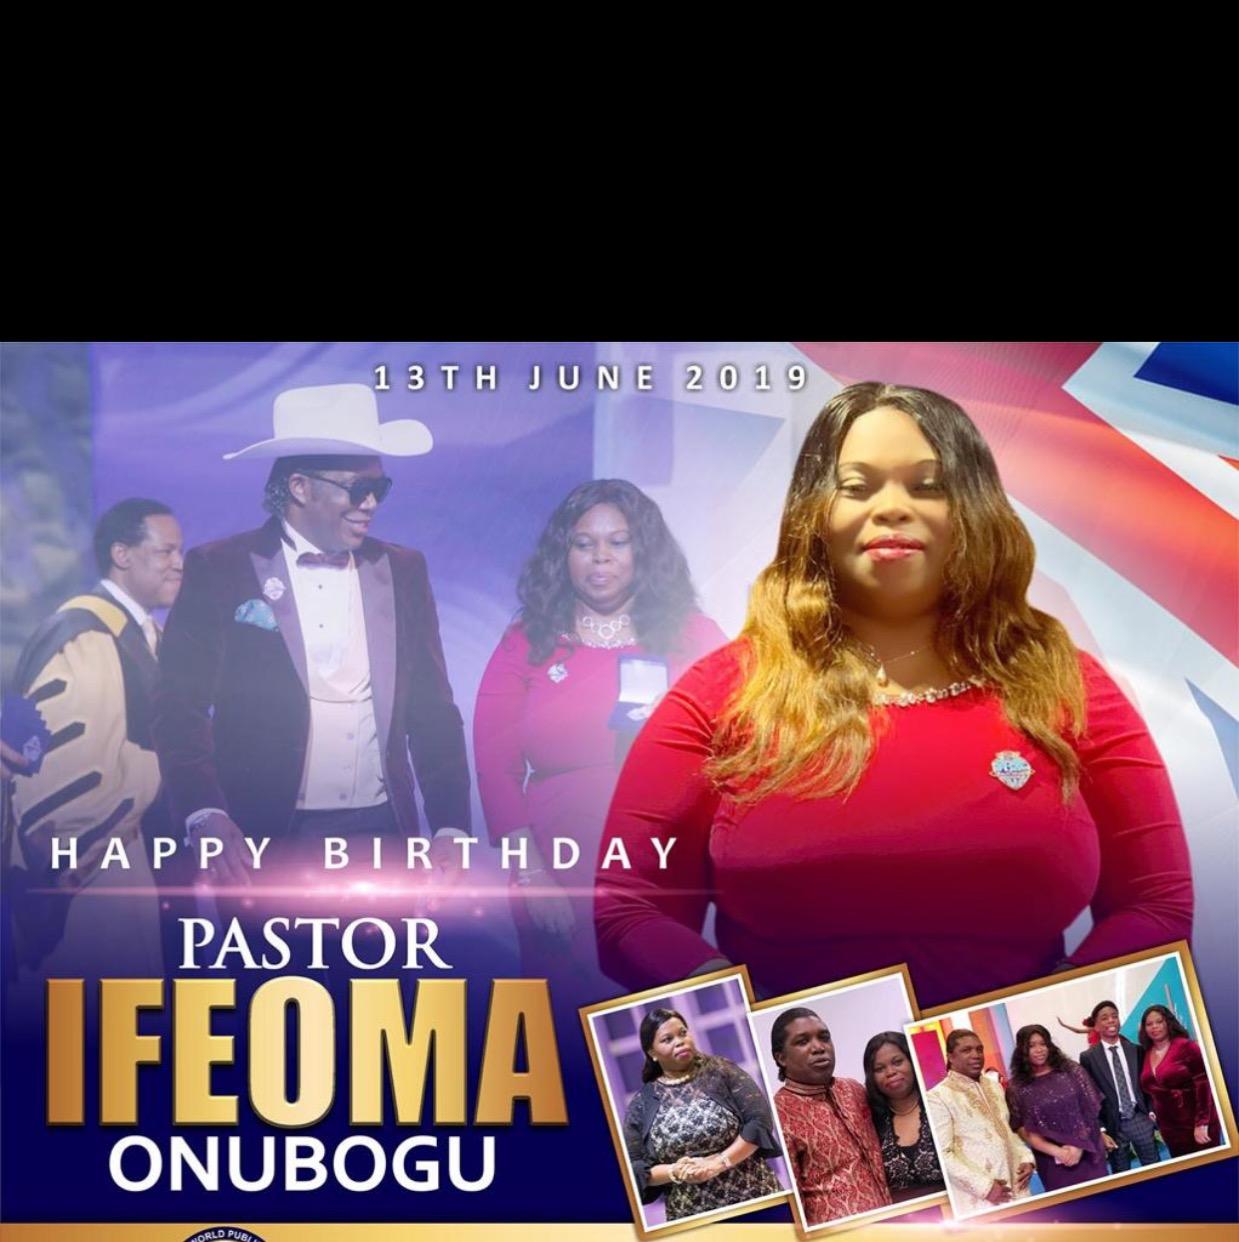 Happy Birthday Our Beloved Pastor